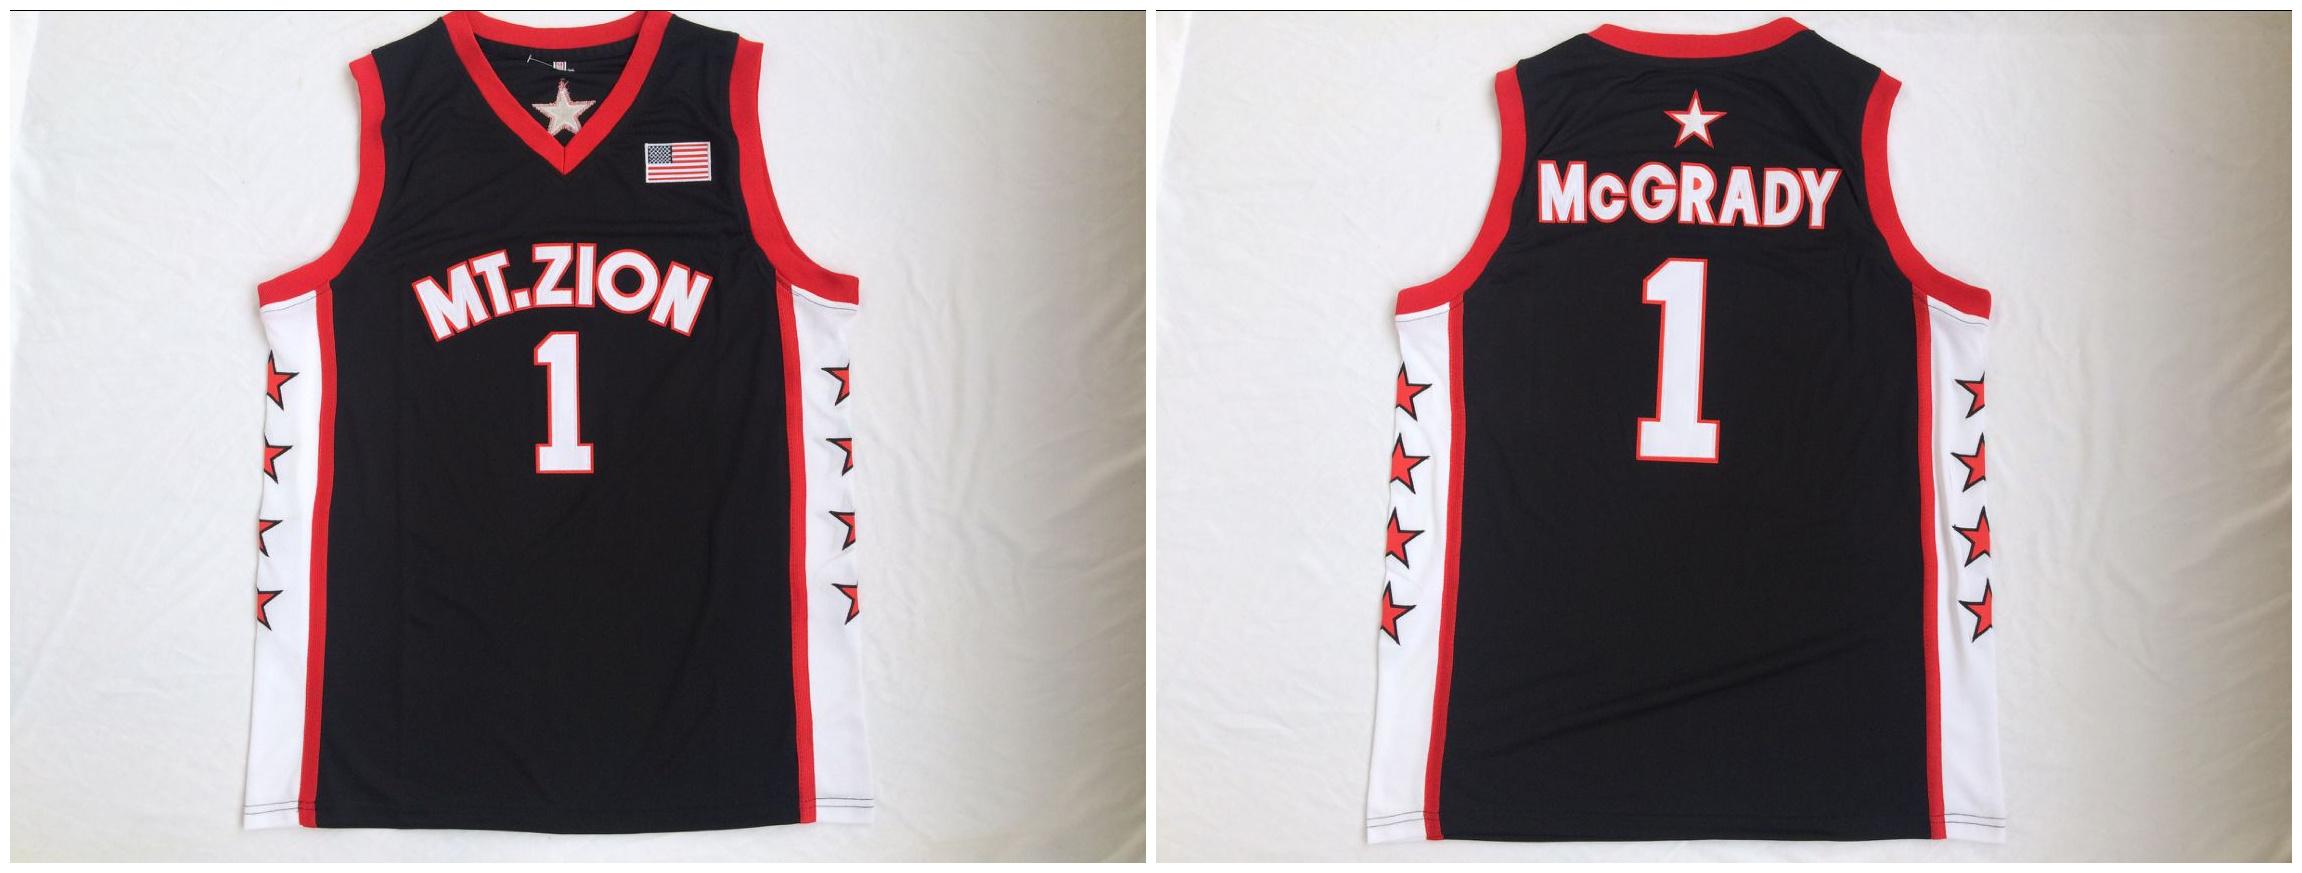 Mount Zion 1 Tracy McGrady Black College Basketball Jersey